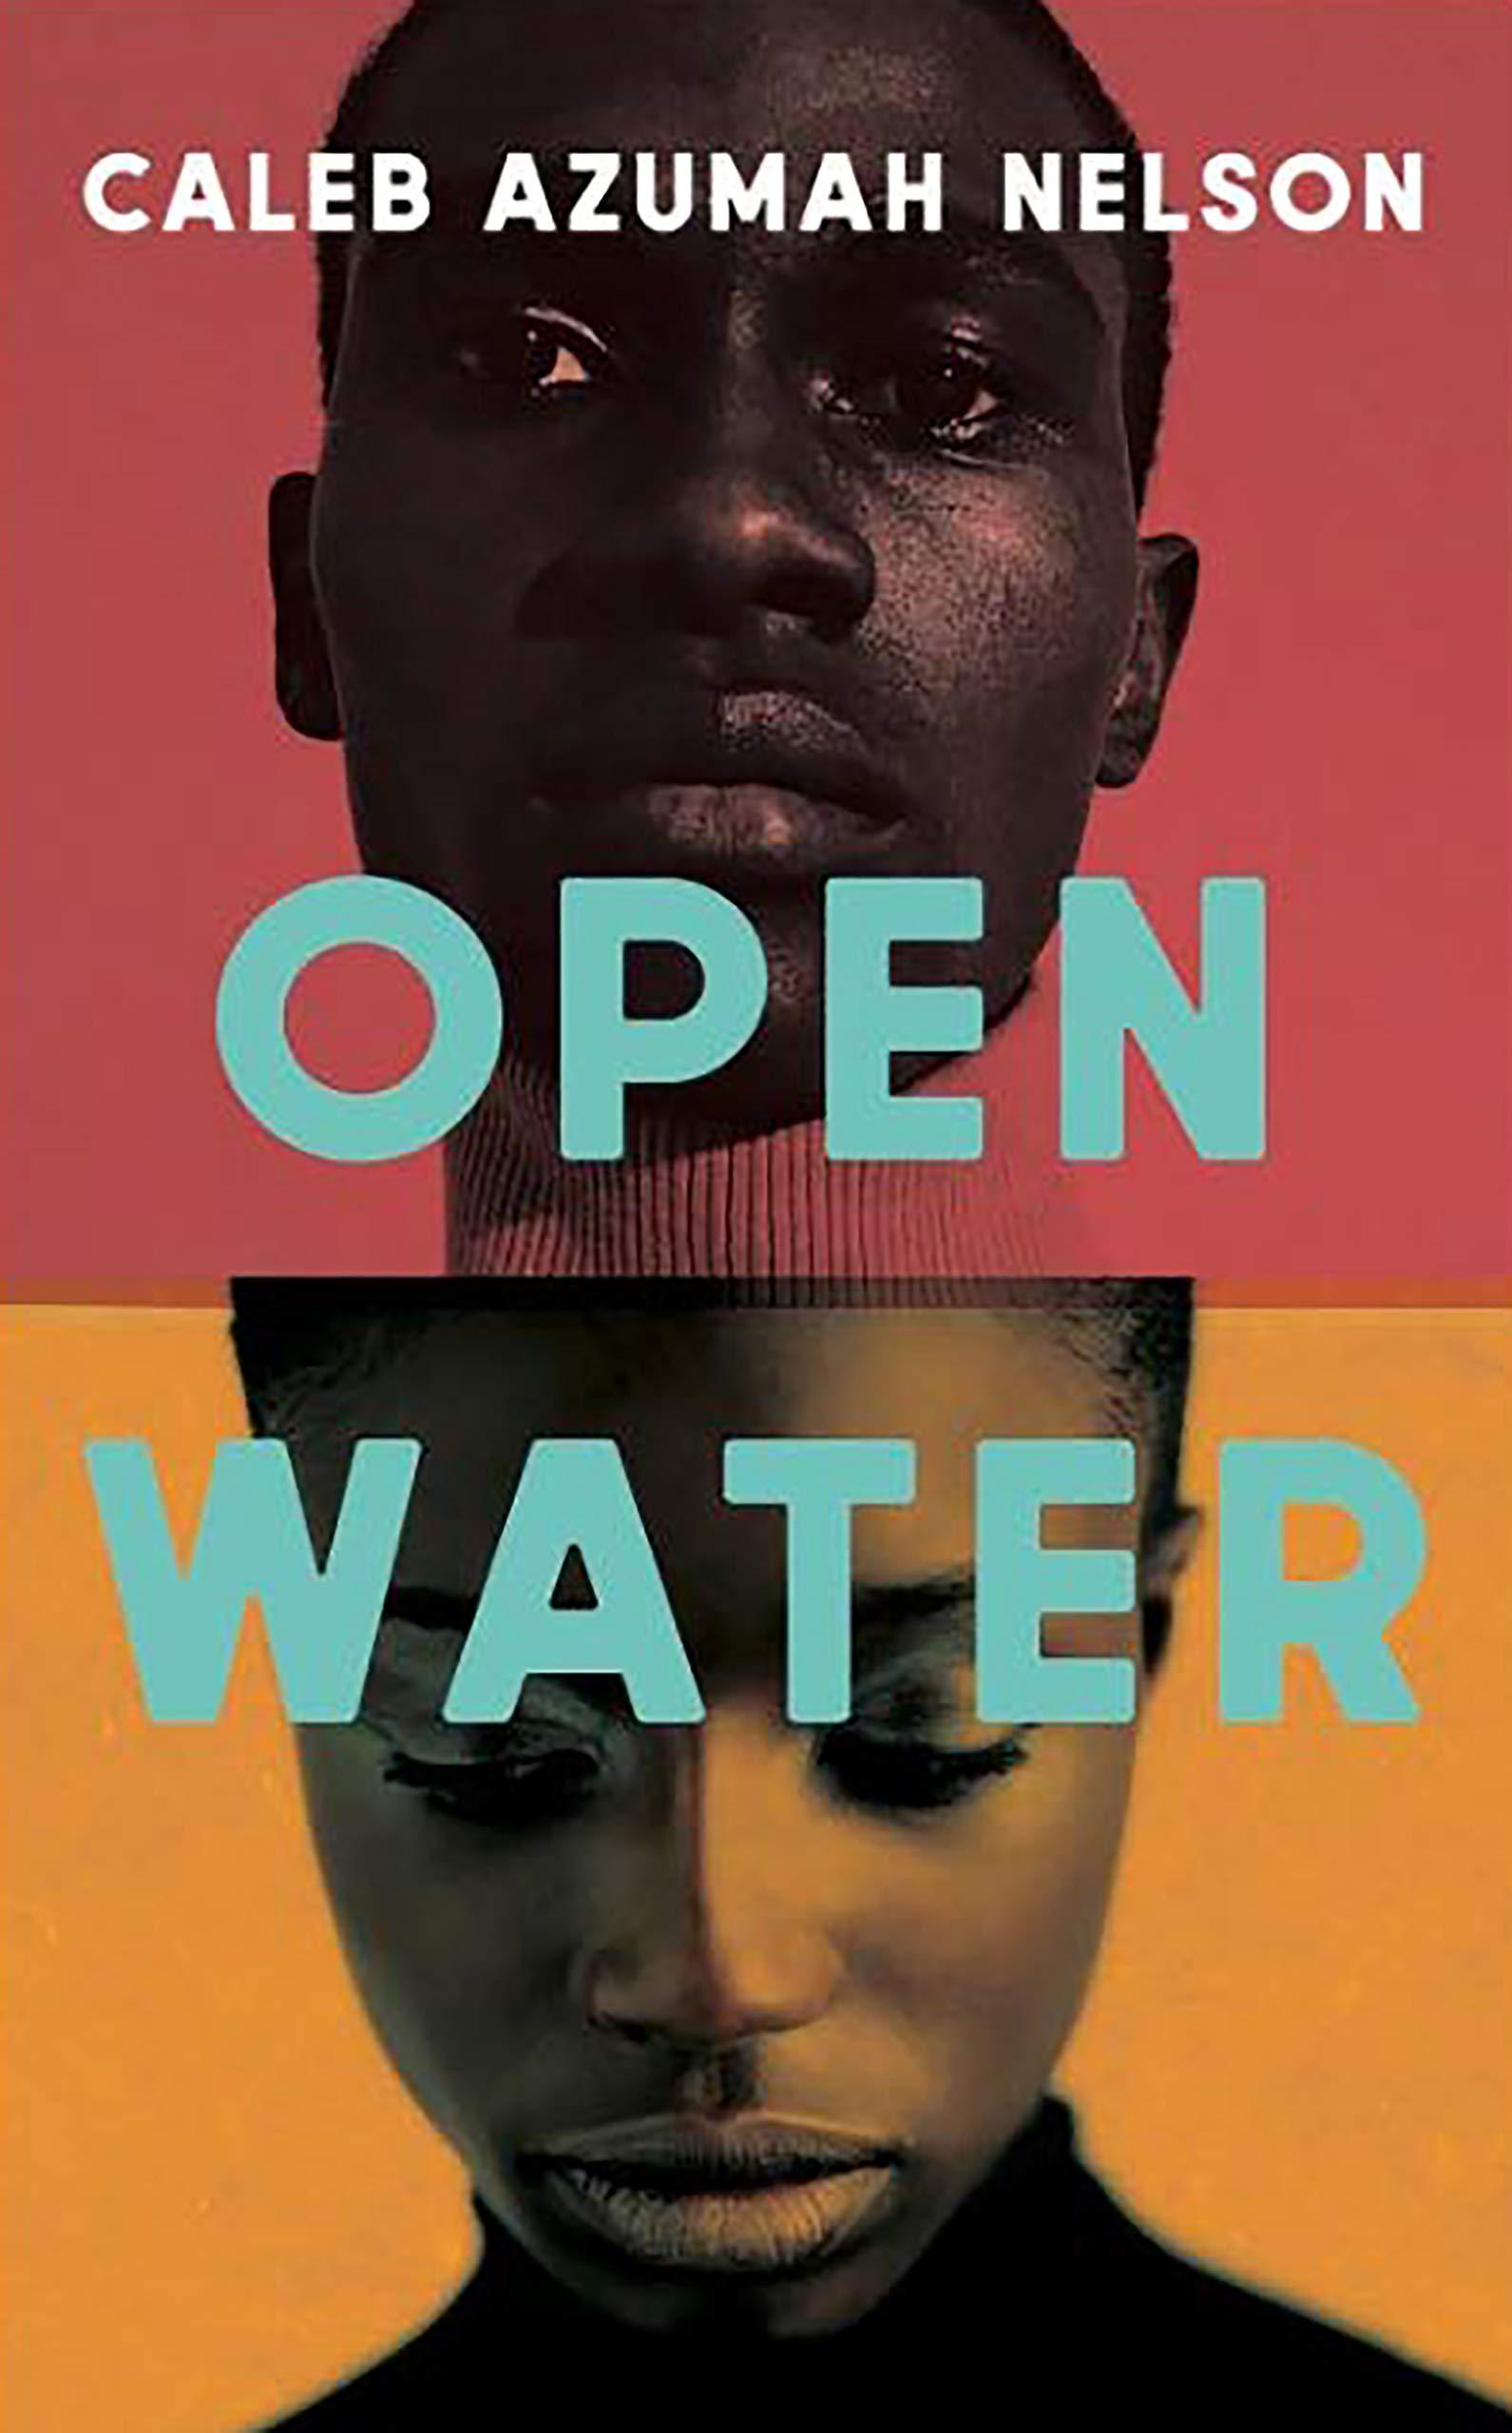 Open Water: Nelson, Caleb Azumah: 9780802157942: Amazon.com: Books